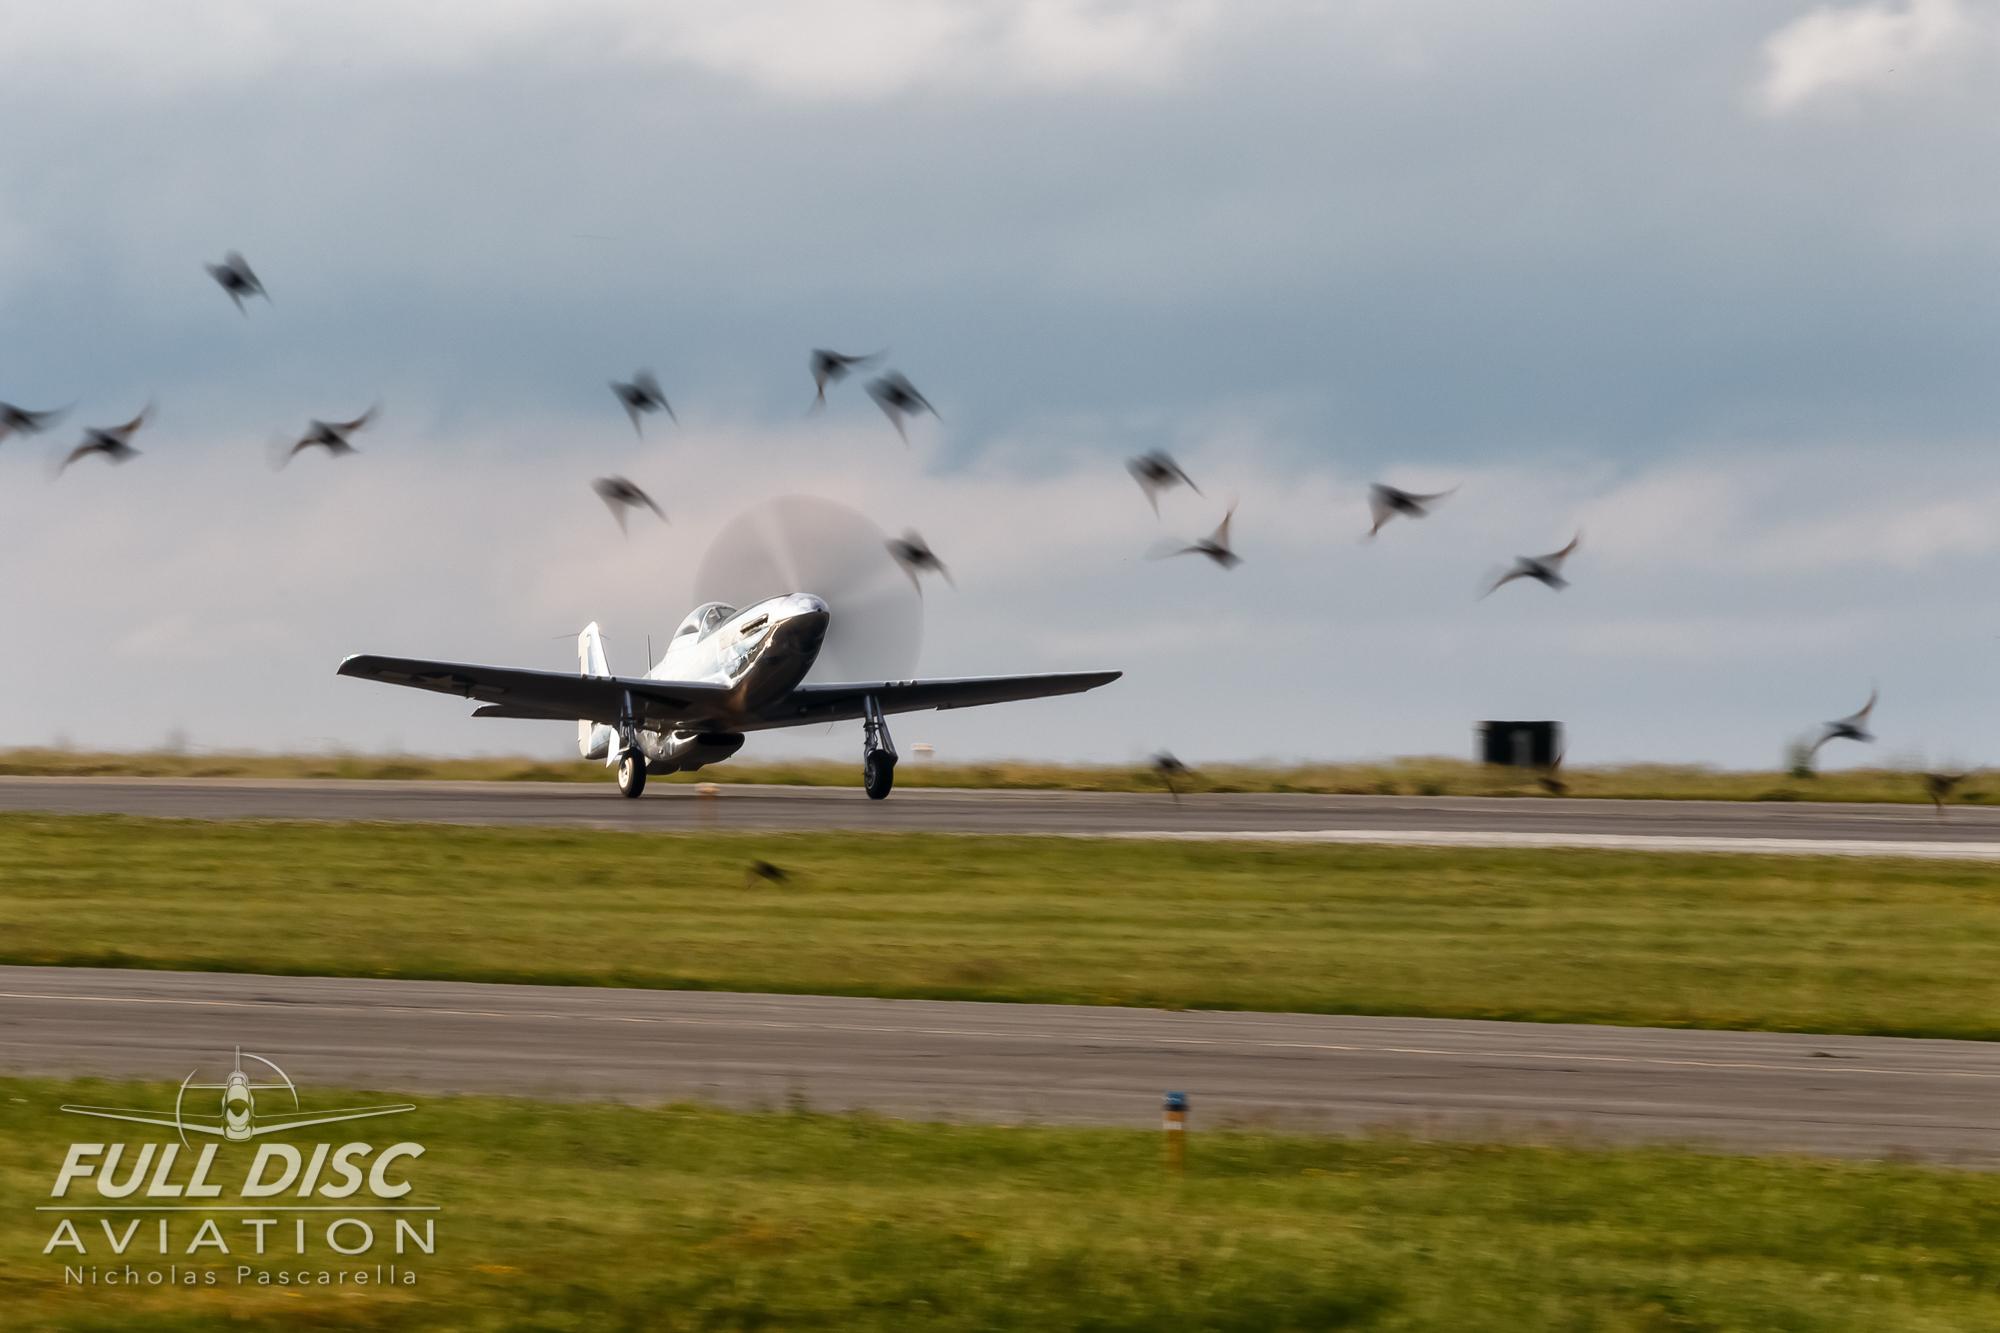 andrewmckenna_fulldiscaviation_nickpascarella_mustang_p51_takeoff_birds.jpg